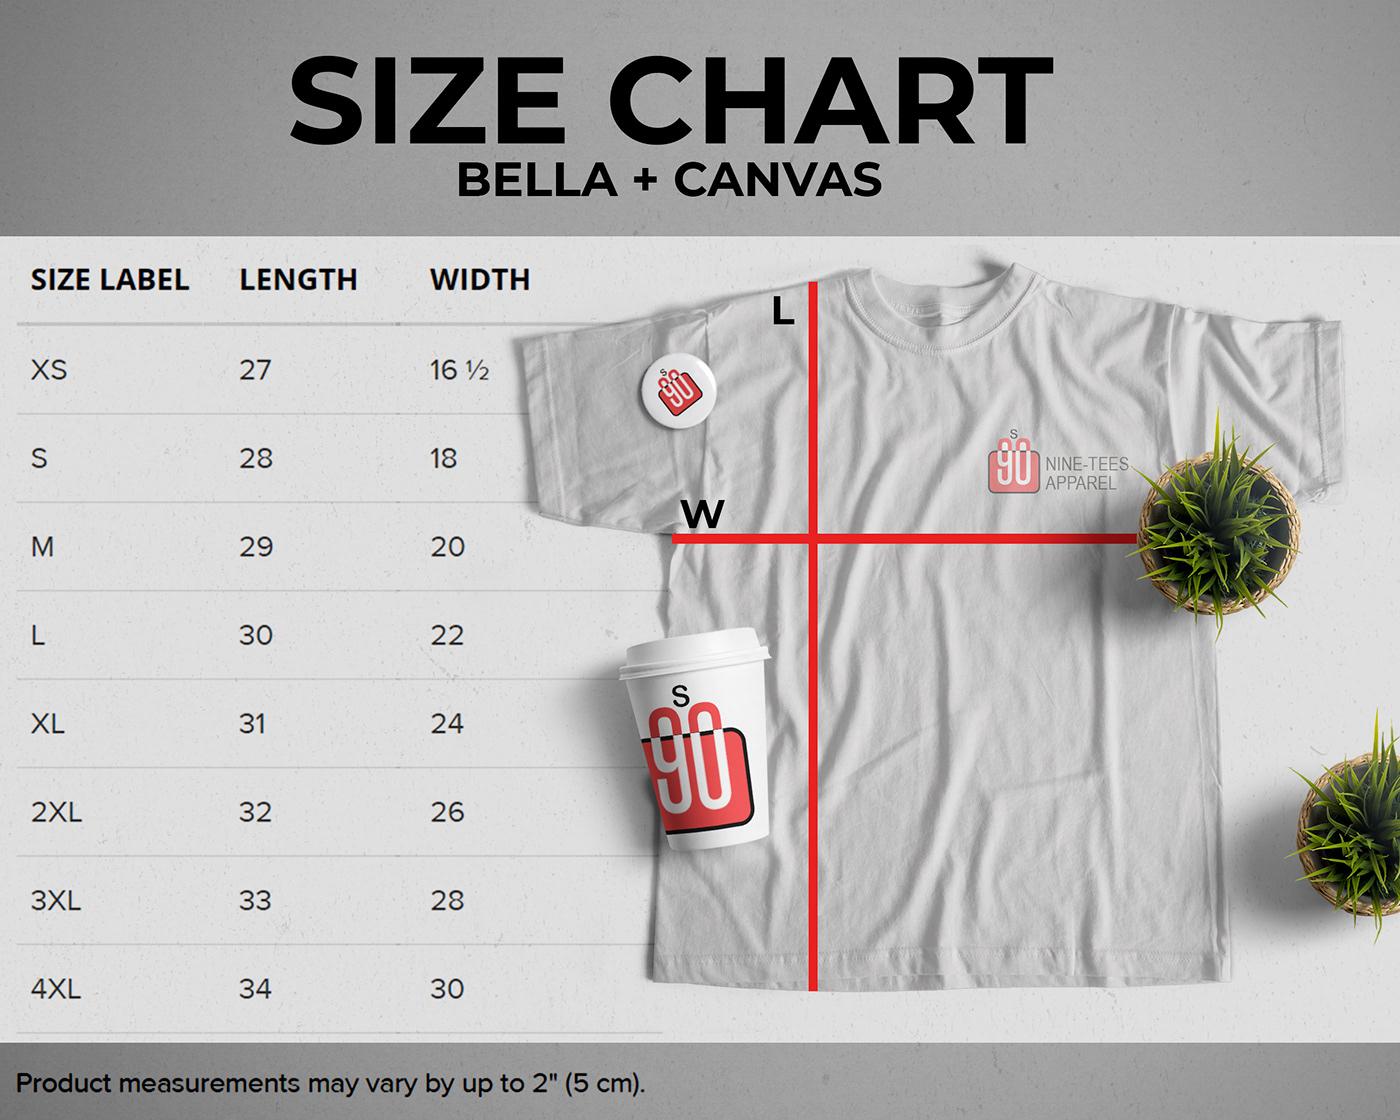 Brand Design Clothing clothing design Clothing Product graphic design  tees apparel t-shirt T-Shirt Design teespring